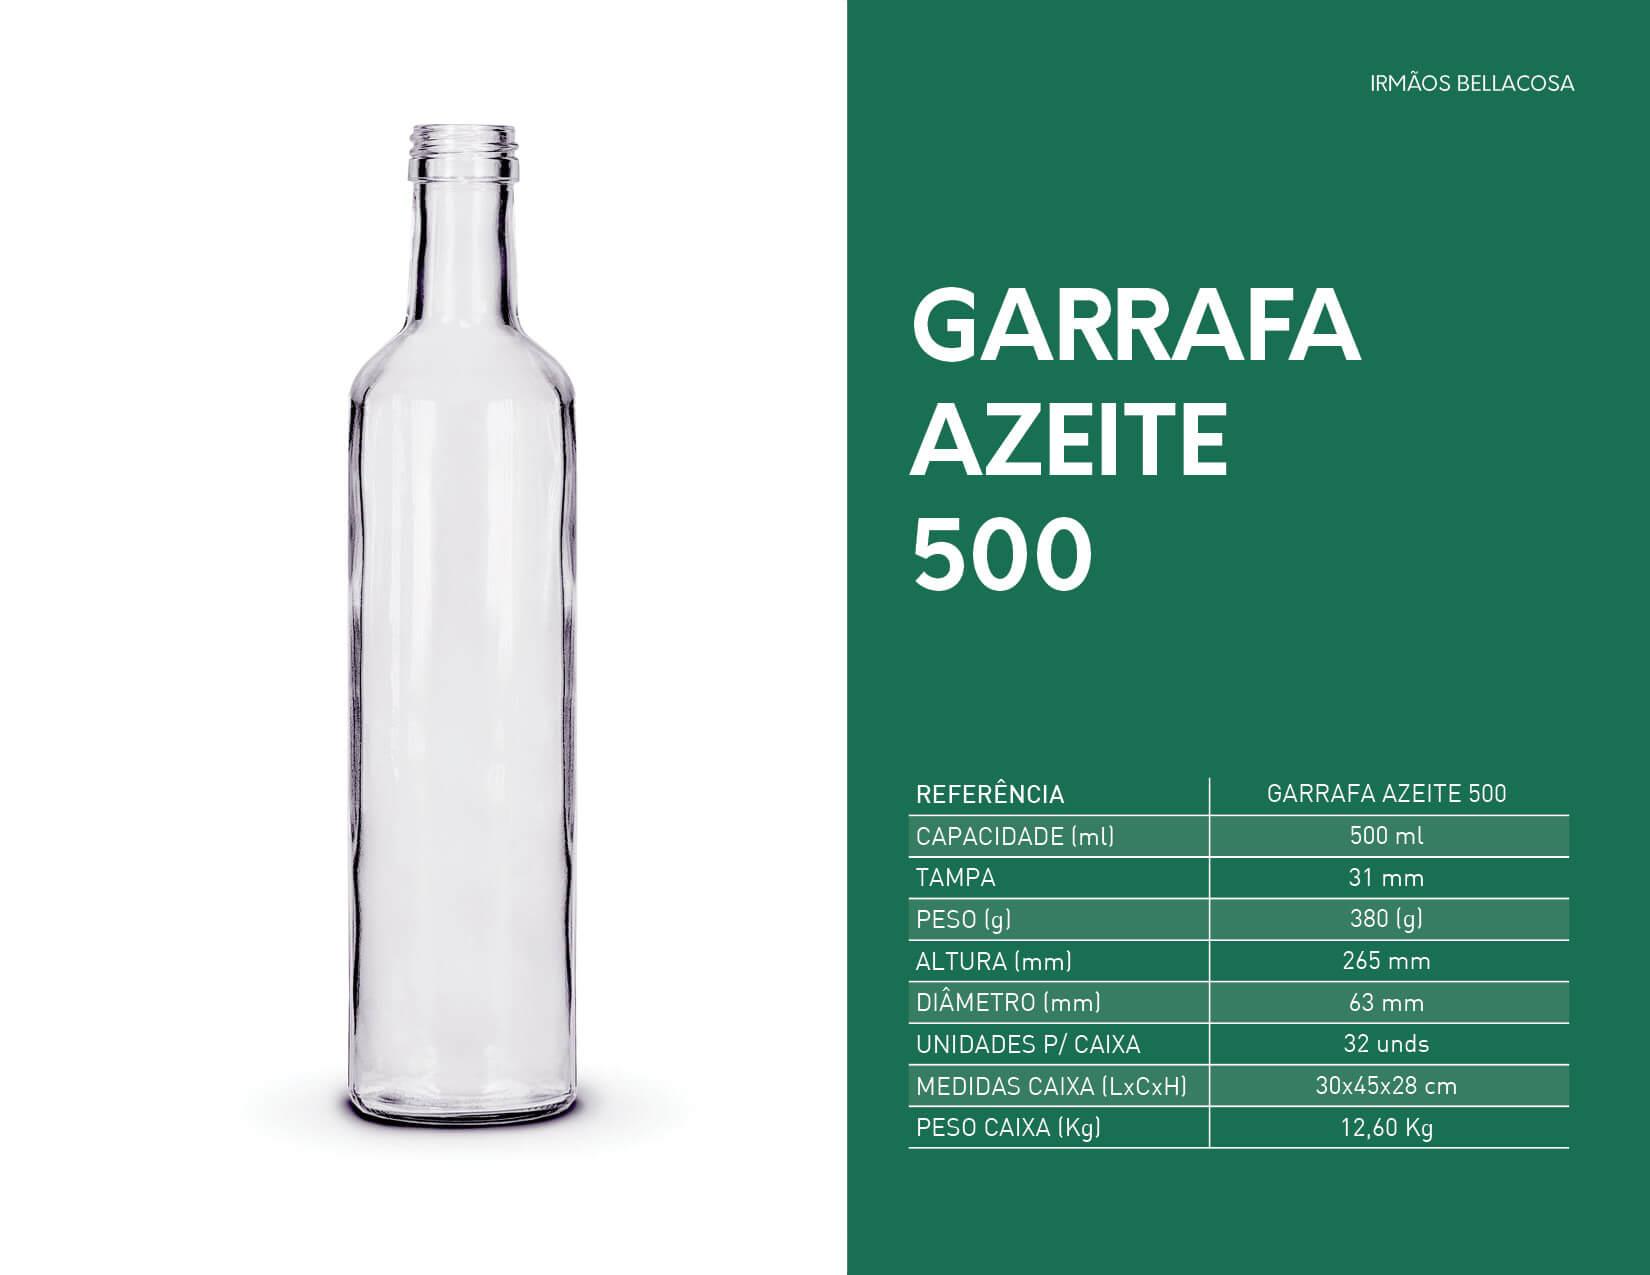 031-Garrafa-azeite-500-irmaos-bellacosa-embalagens-de-vidro